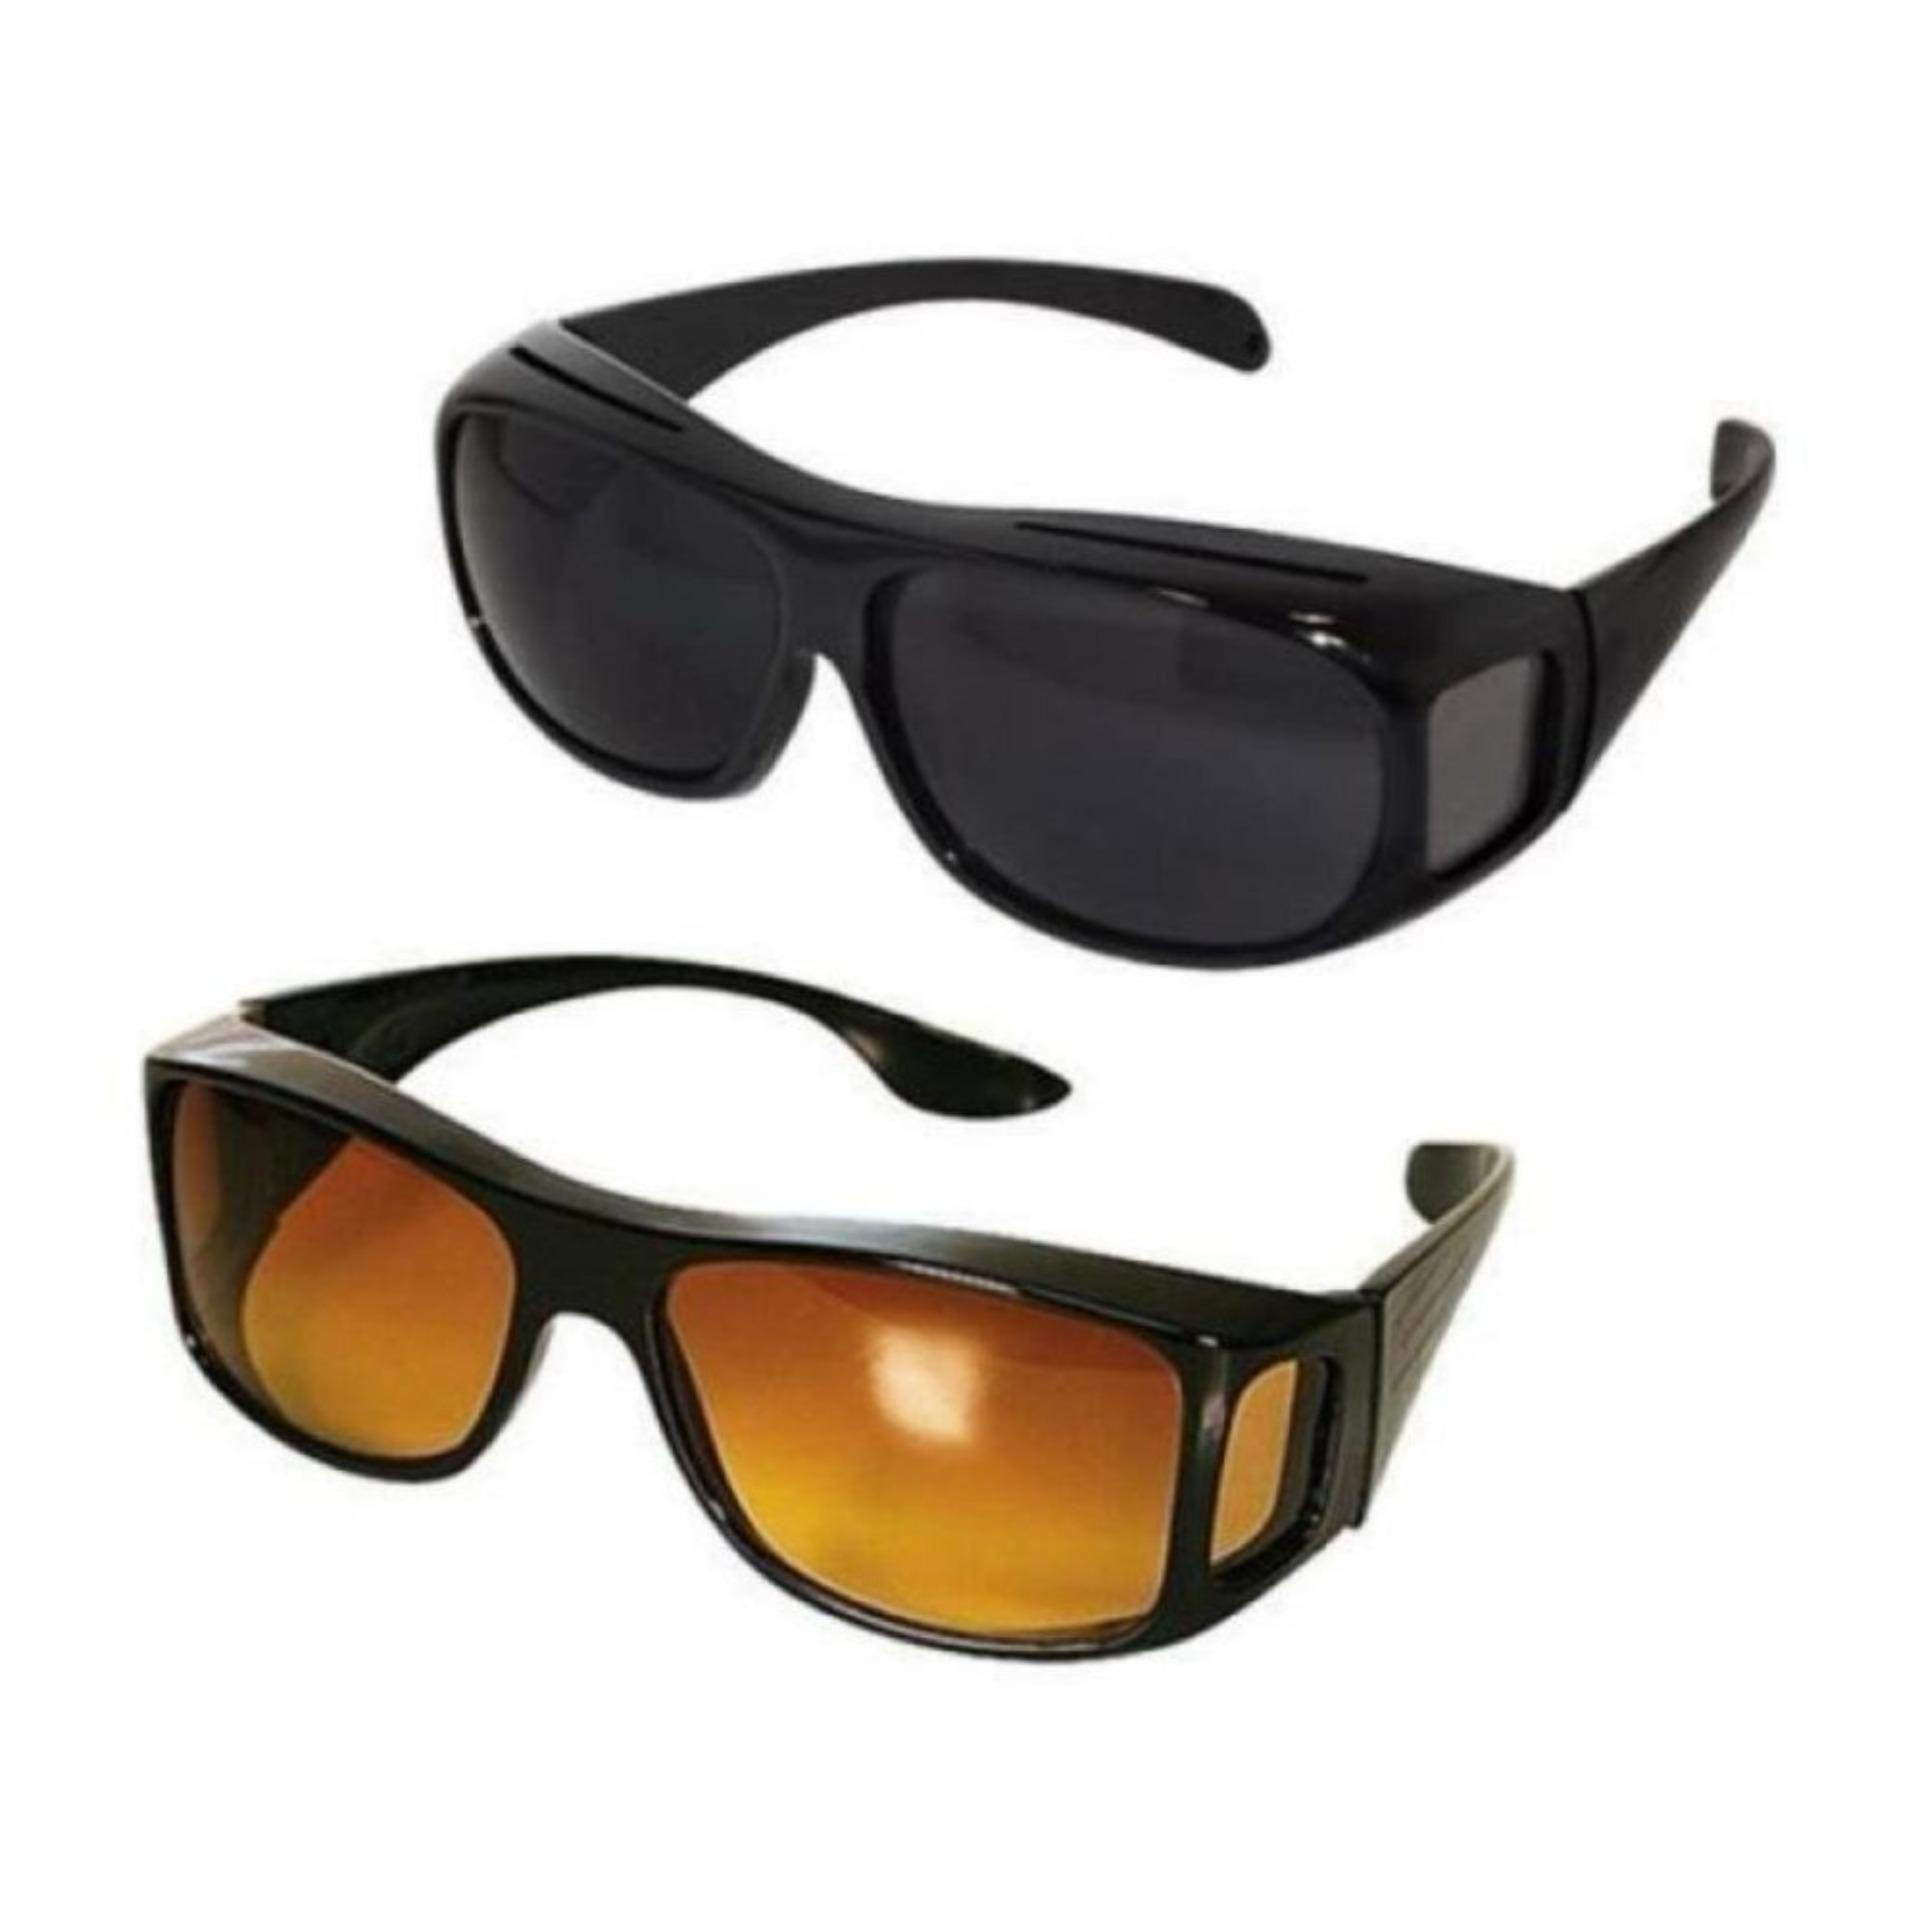 36ea92f76186 HD Vision Anti Glare Night View Driving Glasses Wrap Around Sunglasses Set  of 2